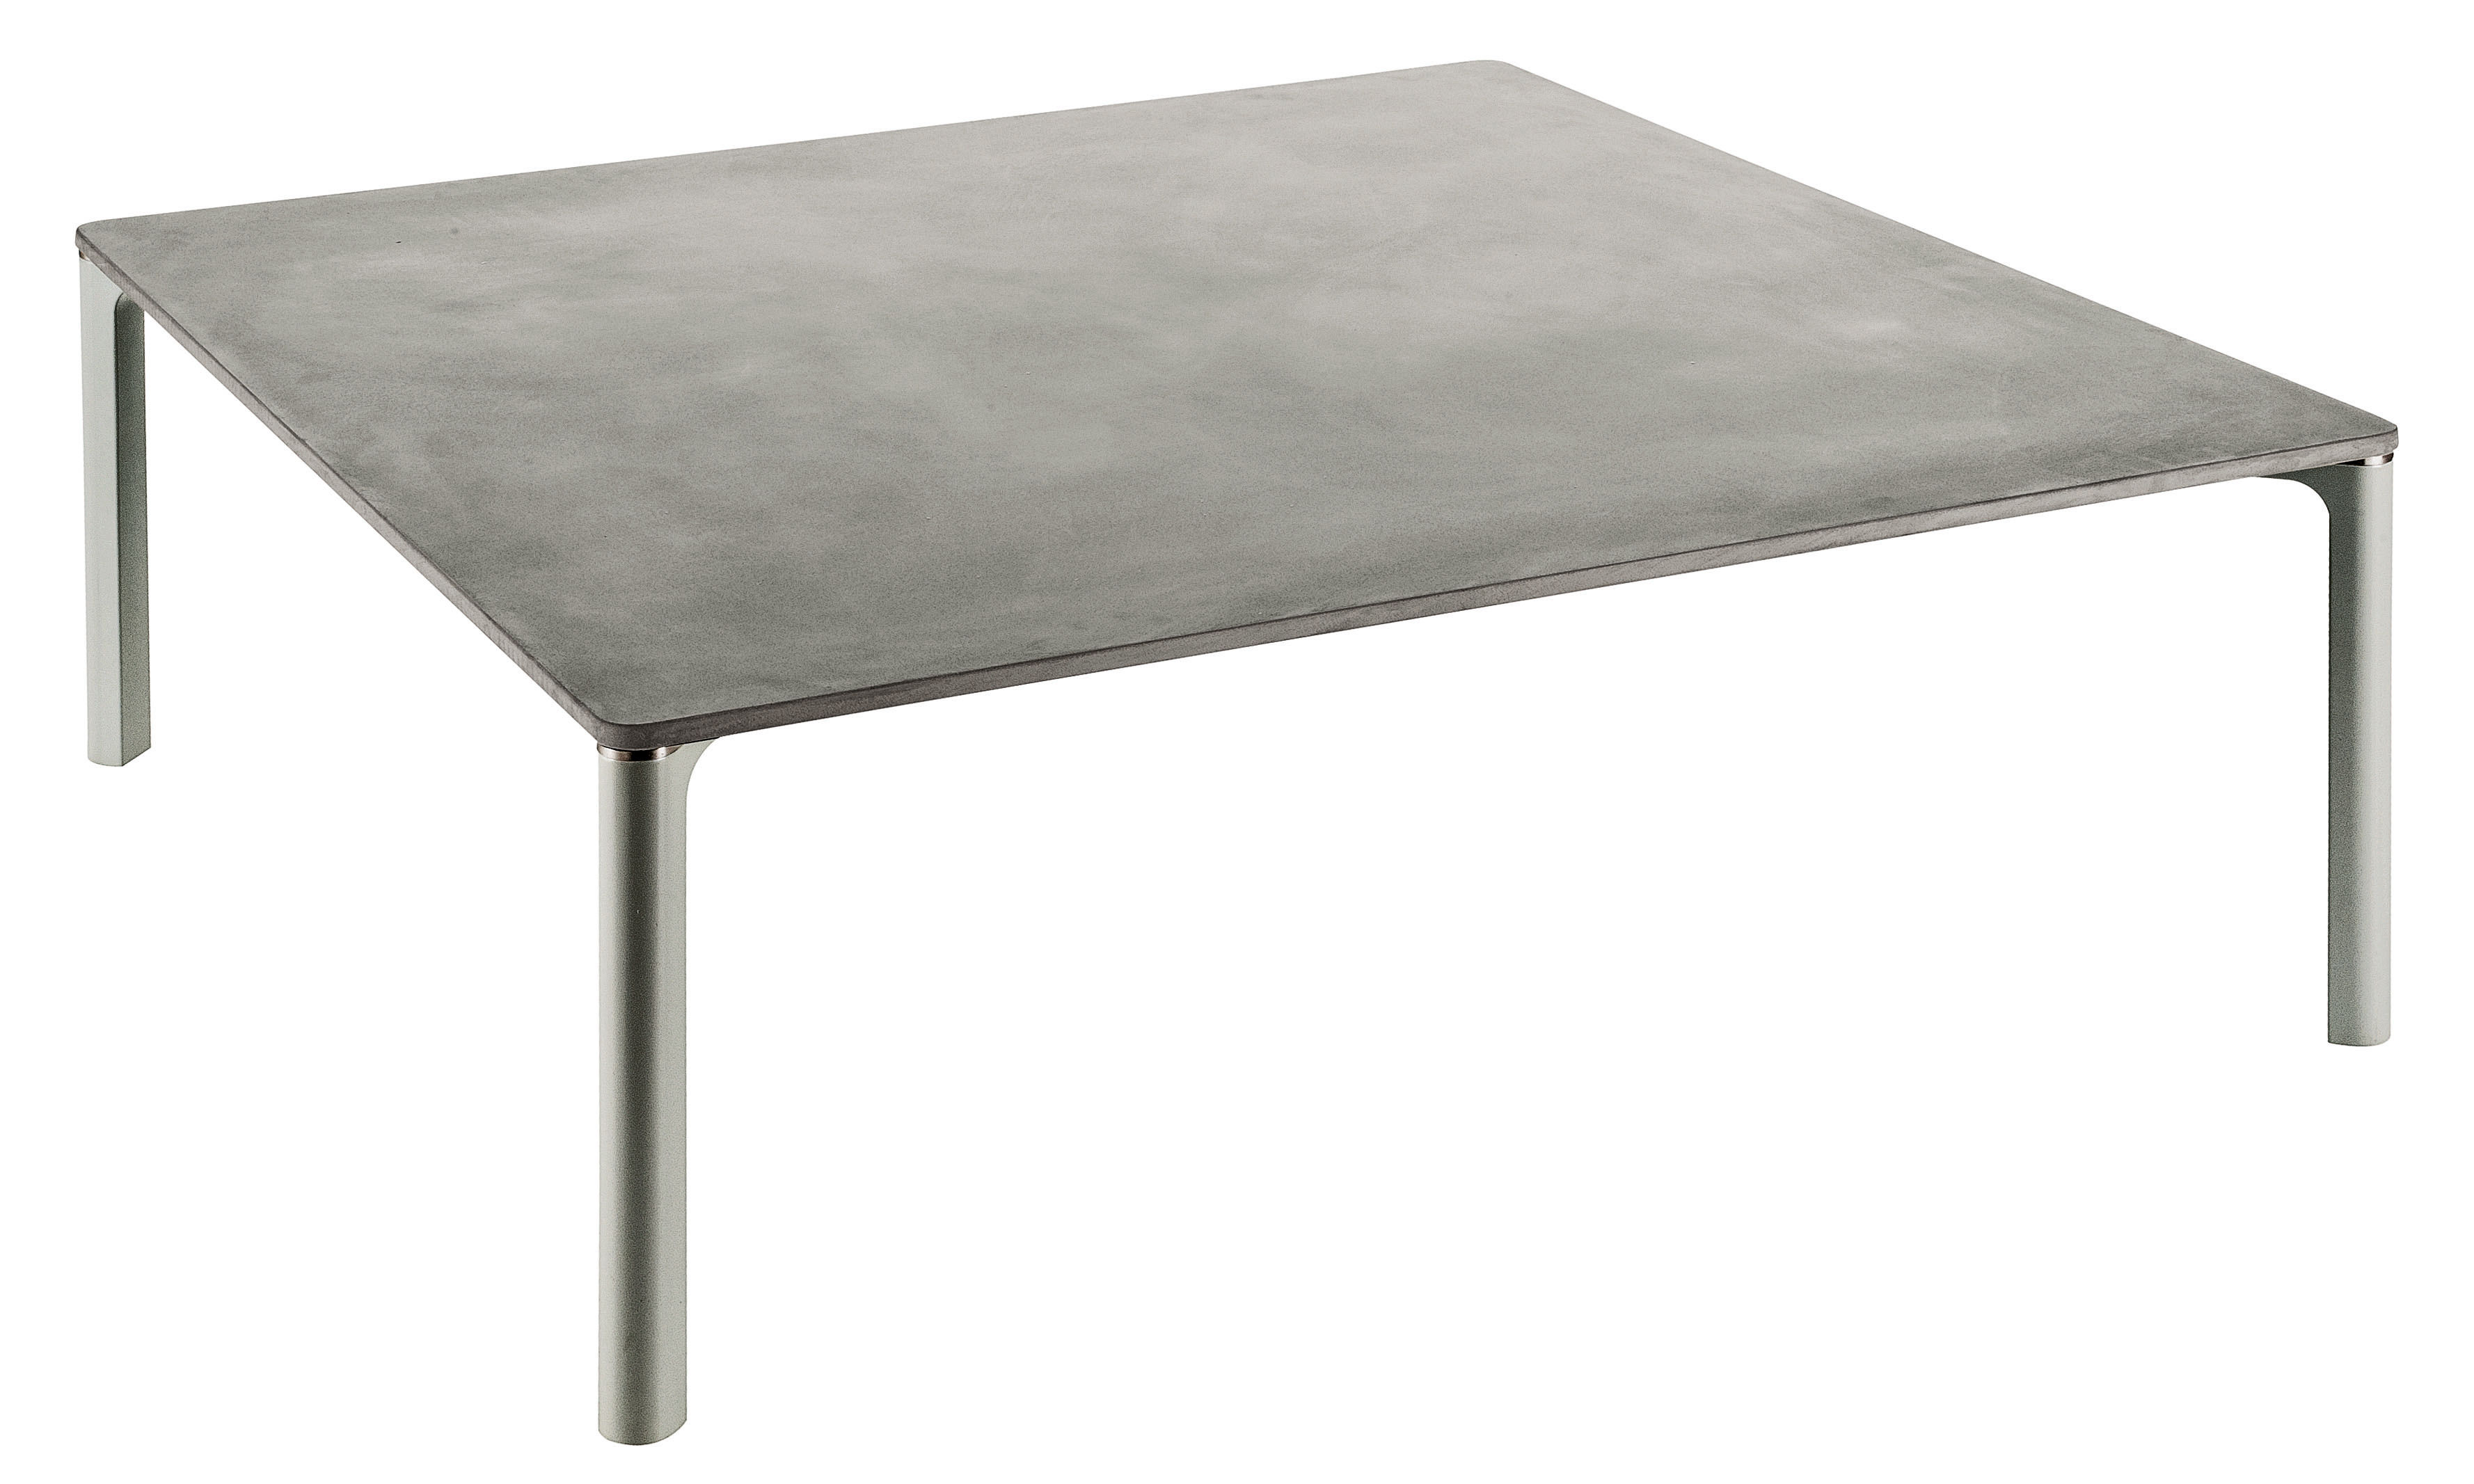 table basse spillino 110 x 110 cm ciment pieds gris. Black Bedroom Furniture Sets. Home Design Ideas